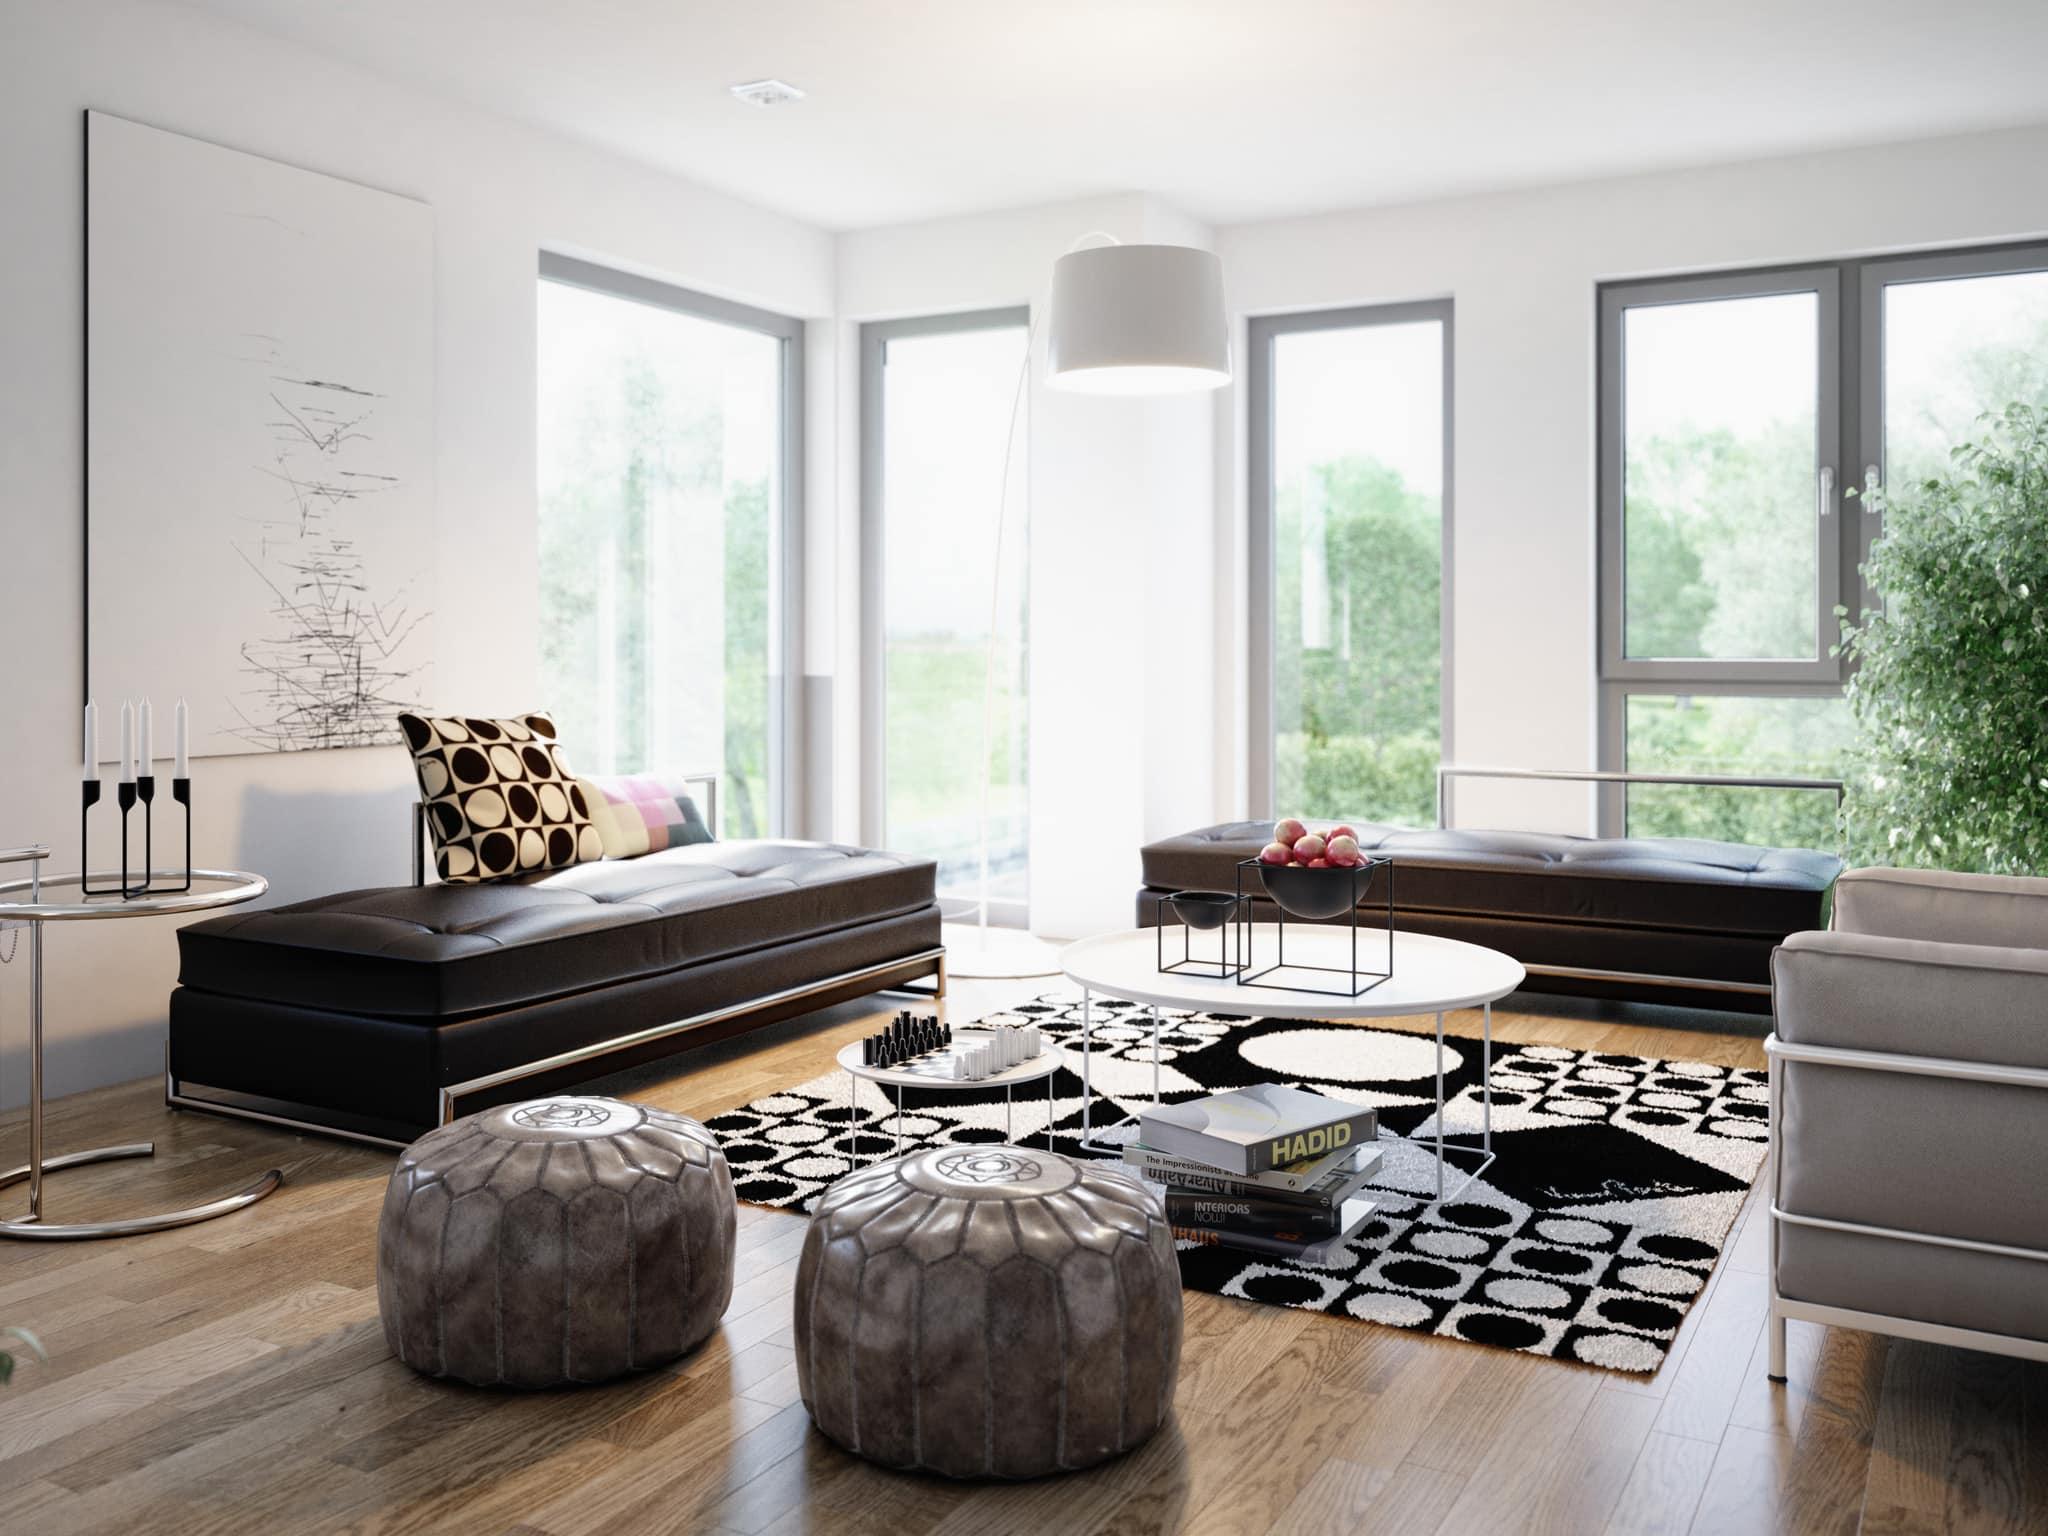 Wohnzimmer Ideen Galerie - Inneneinrichtung Fertighaus Stadtvilla Living Haus SUNSHINE 151 V6 - HausbauDirekt.de